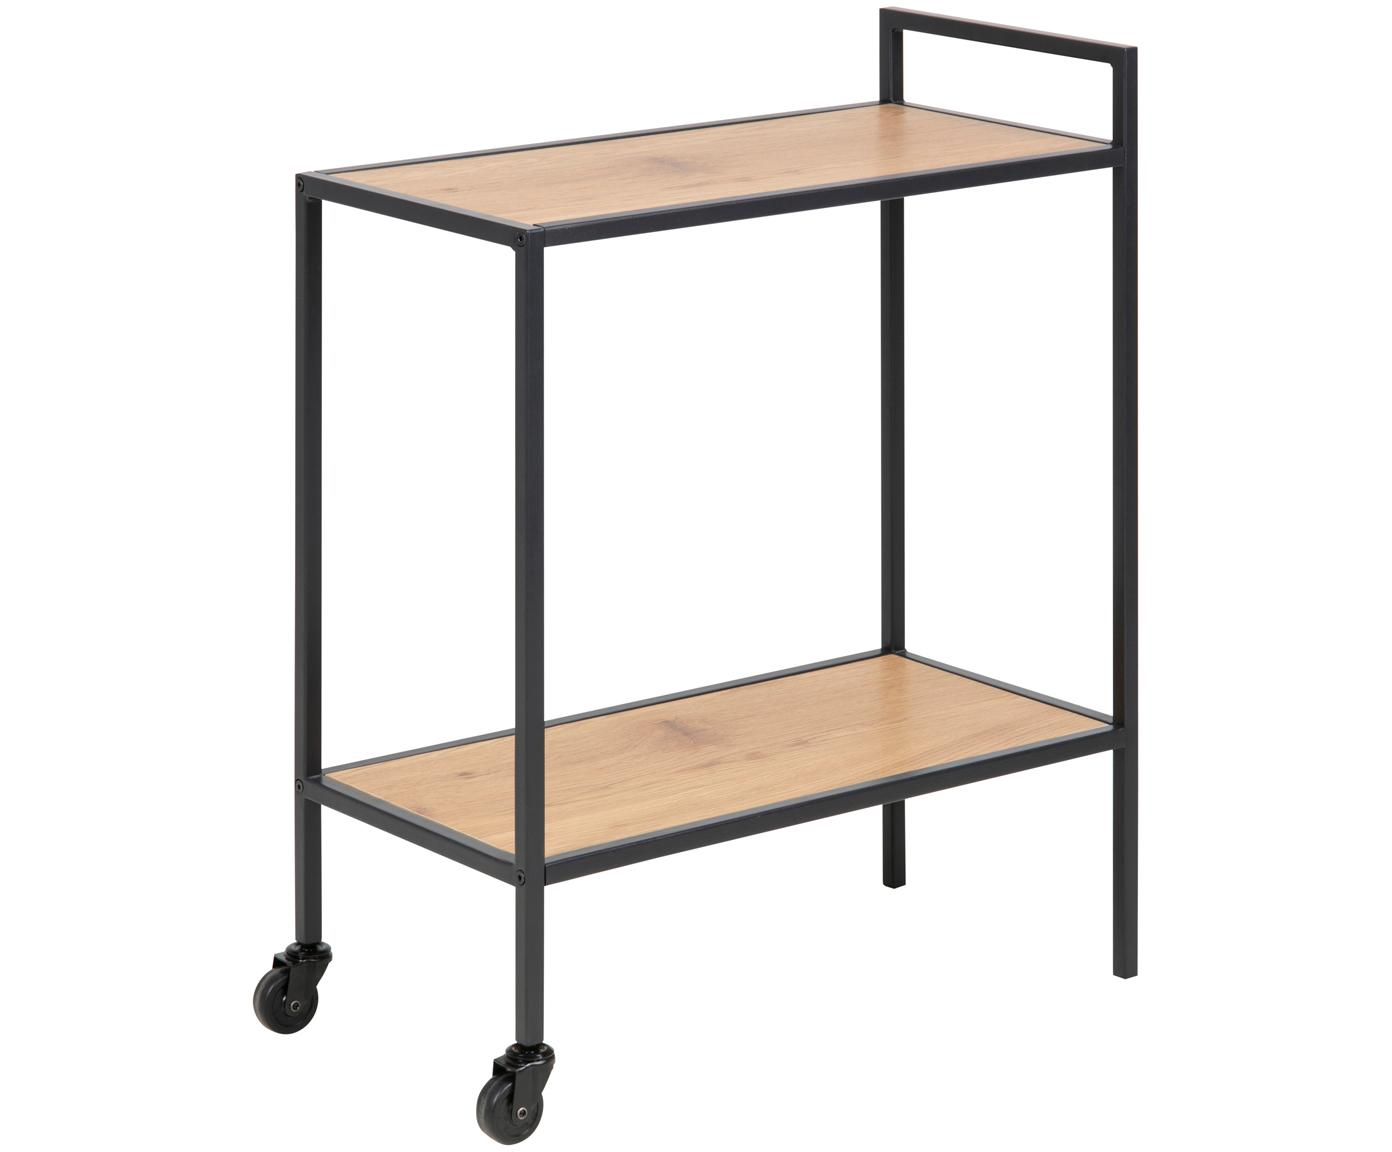 Bar cart Seaford van hout en metaal, Plateaus: MDF, Frame: gepoedercoat metaal, Eikenhoutkleurig, zwart, 60 x 75 cm